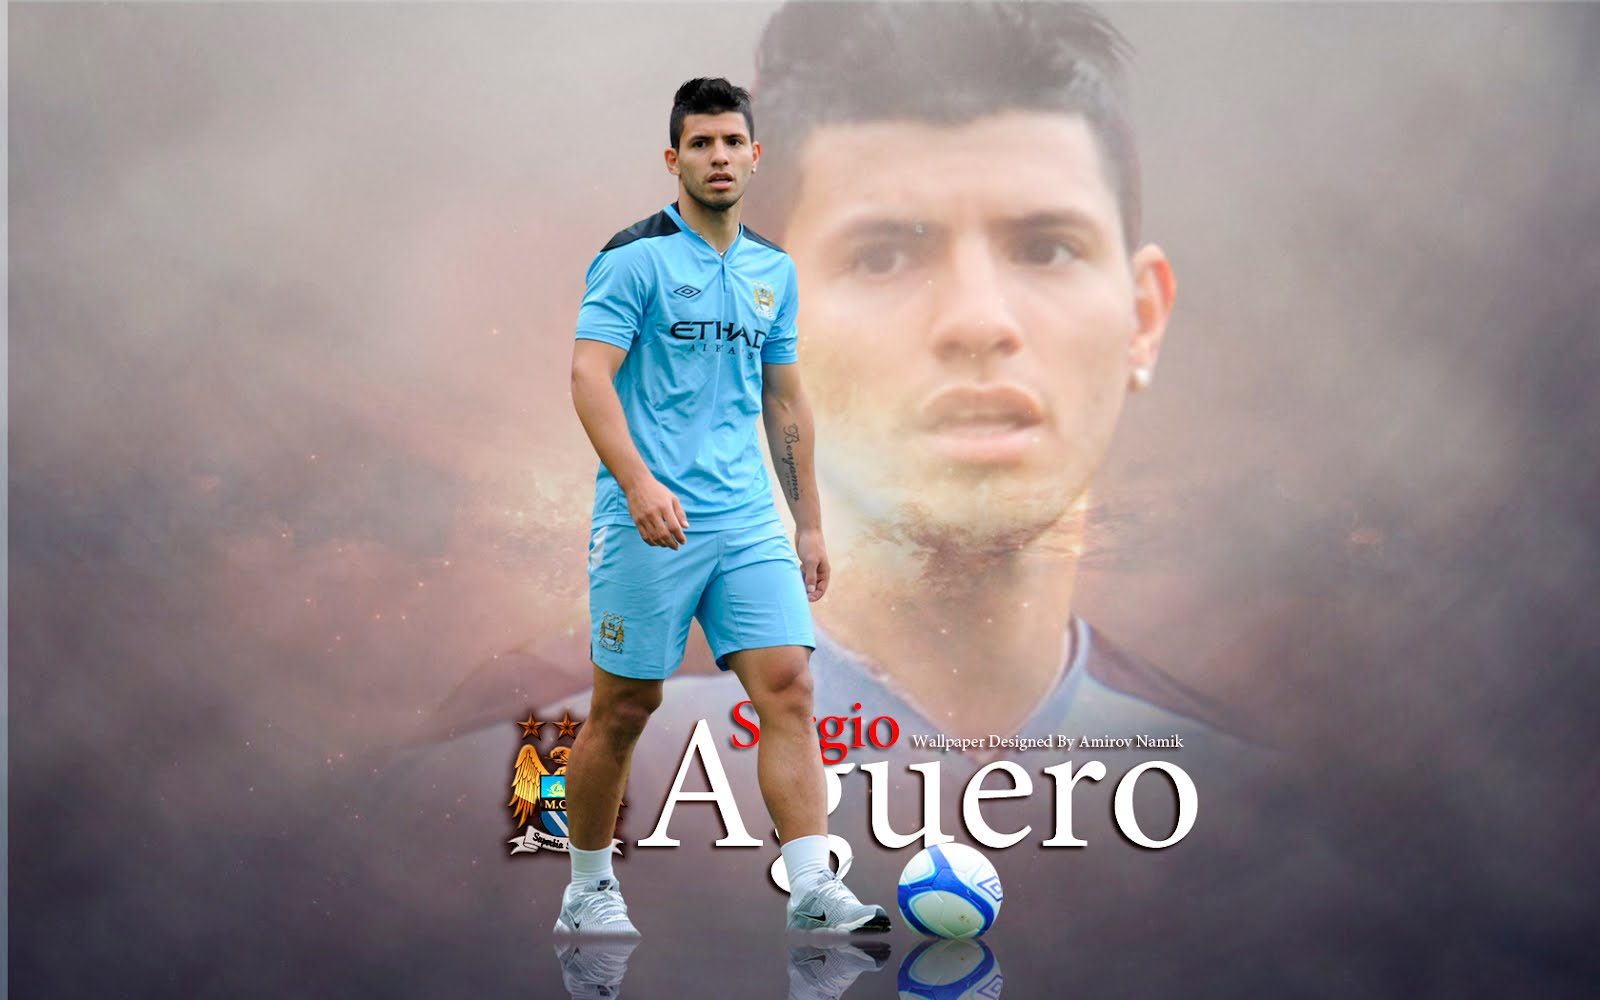 Sergio Aguero Best Player Of Man City 2012 Wallpaper